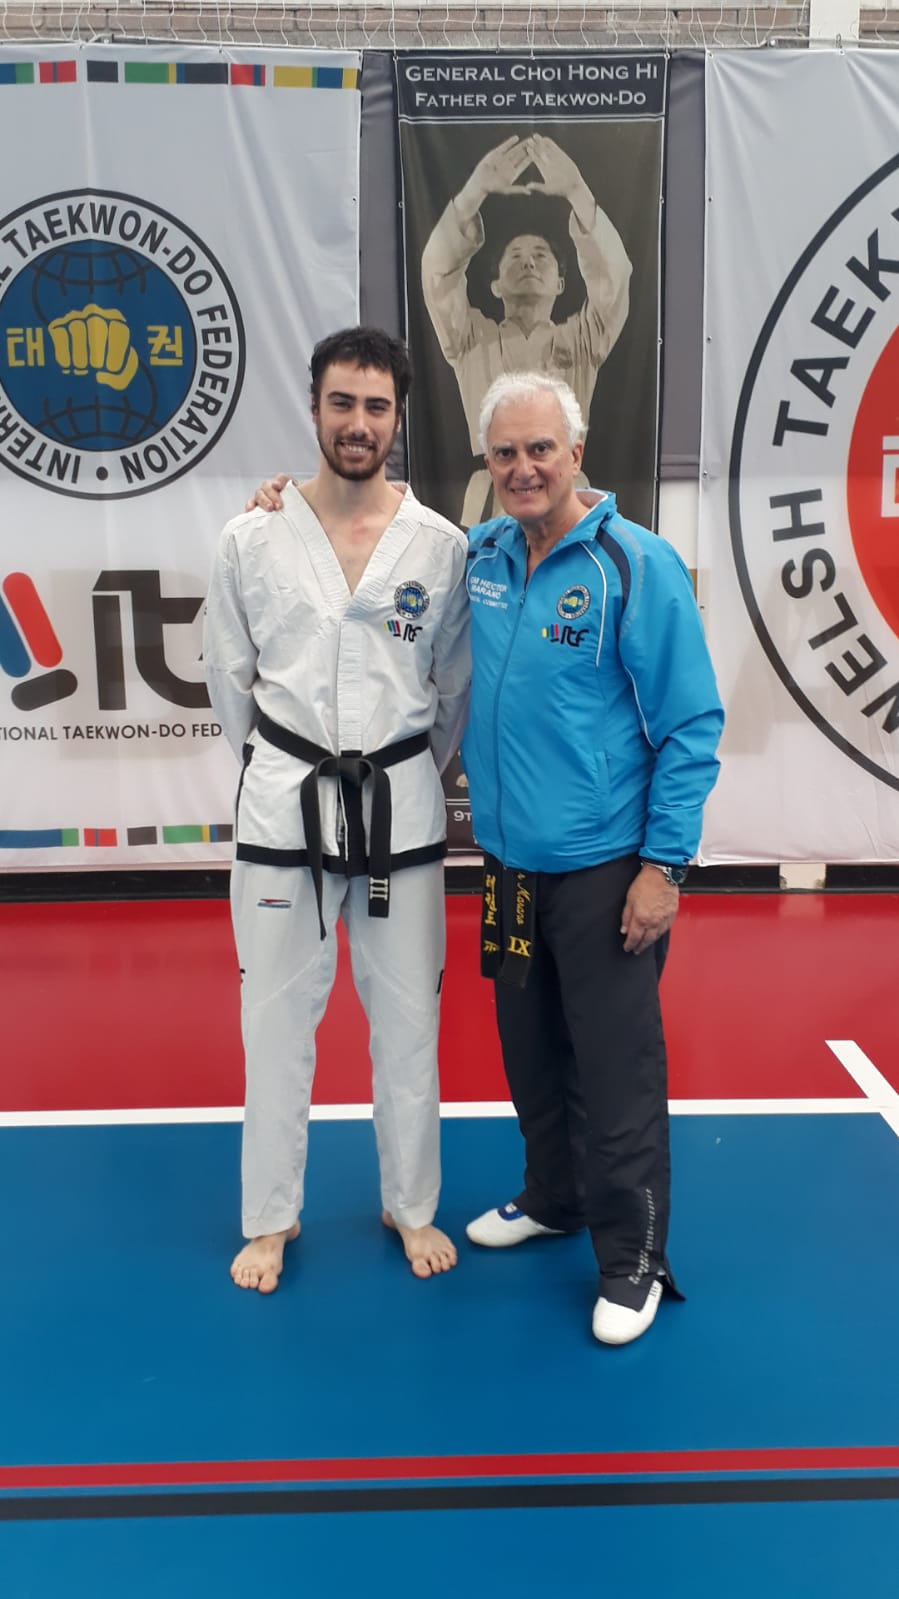 Franco met Grand Master Marano